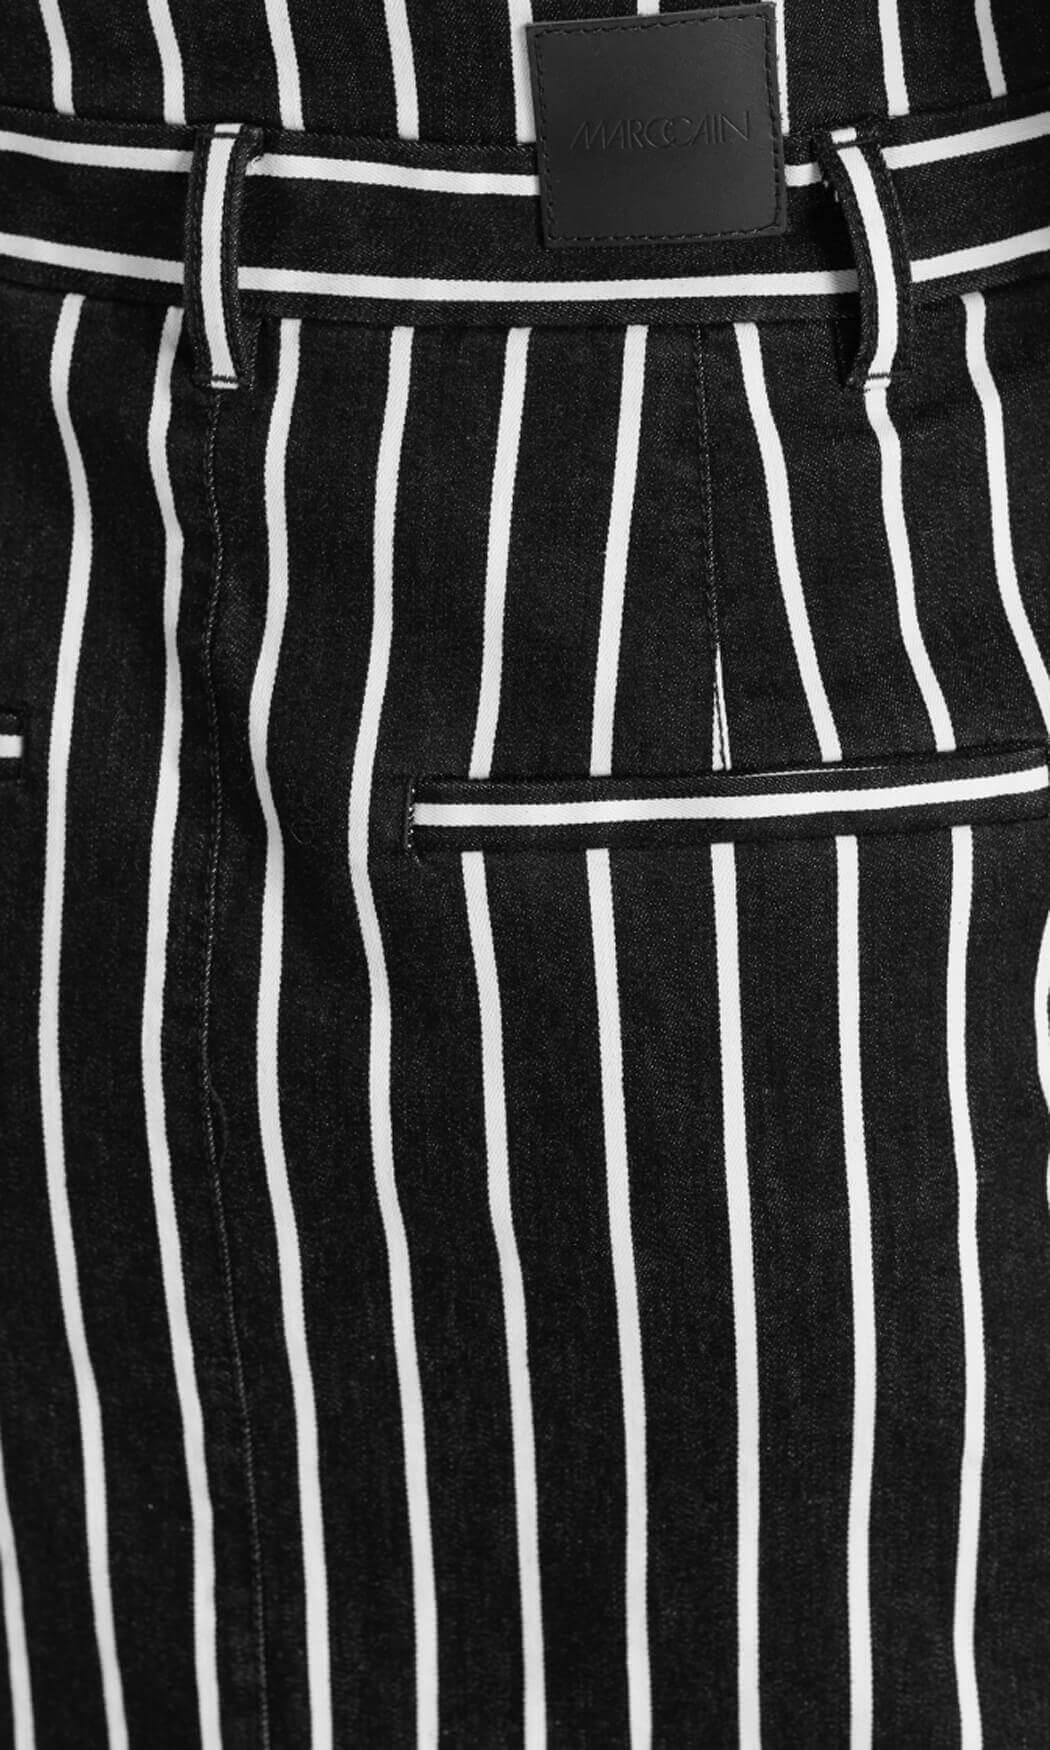 Marccain Sports Dames Gestreepte jeansrok zwart